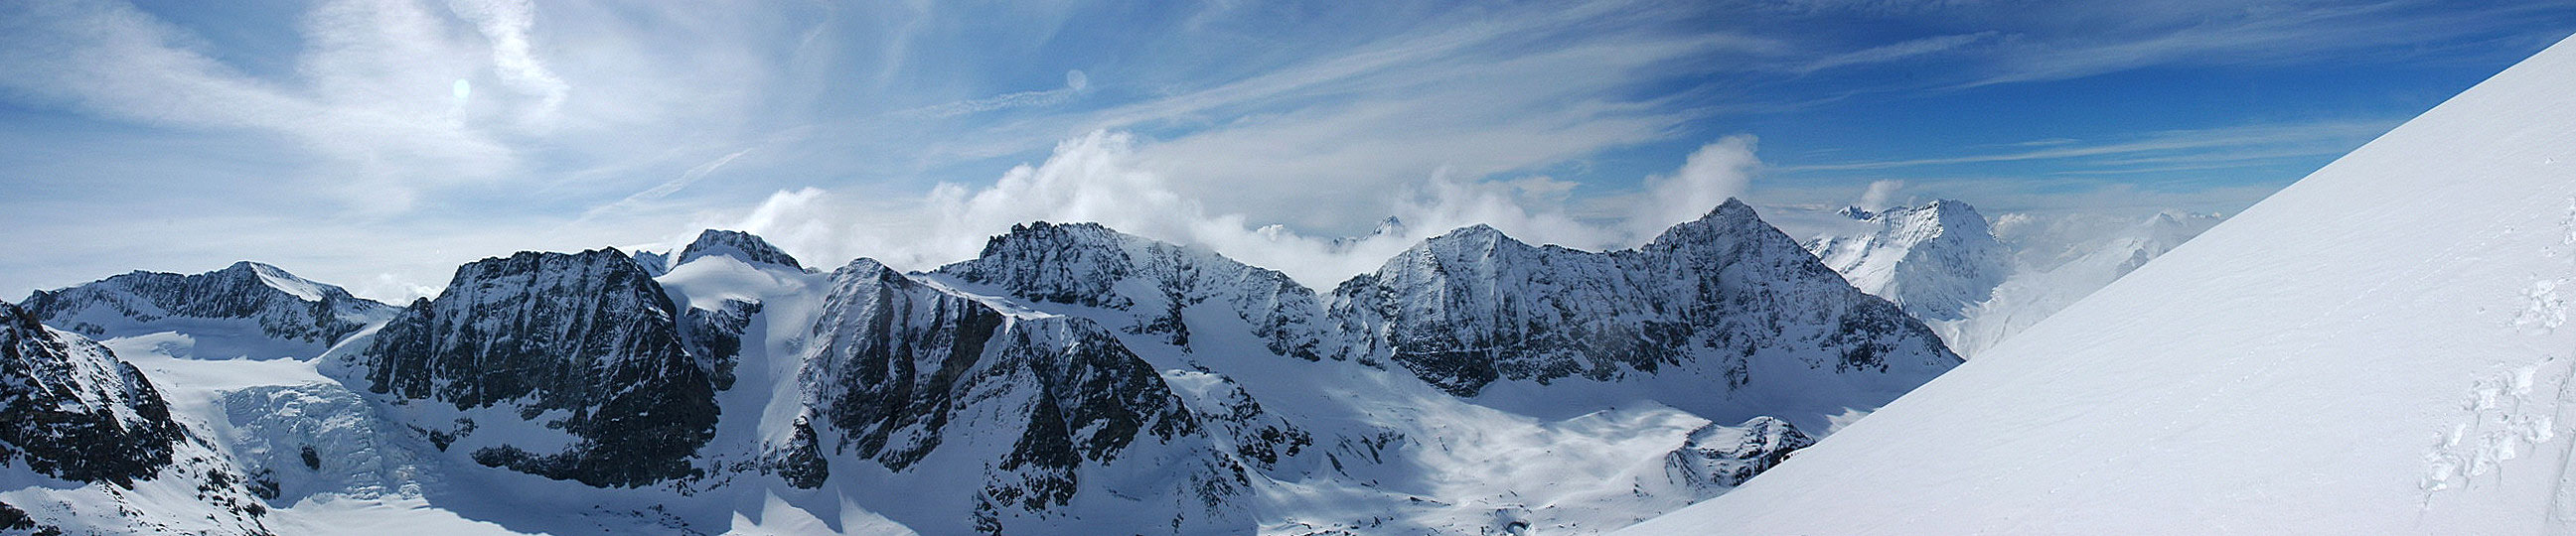 La Ruinette Walliser Alpen / Alpes valaisannes Schweiz panorama 17